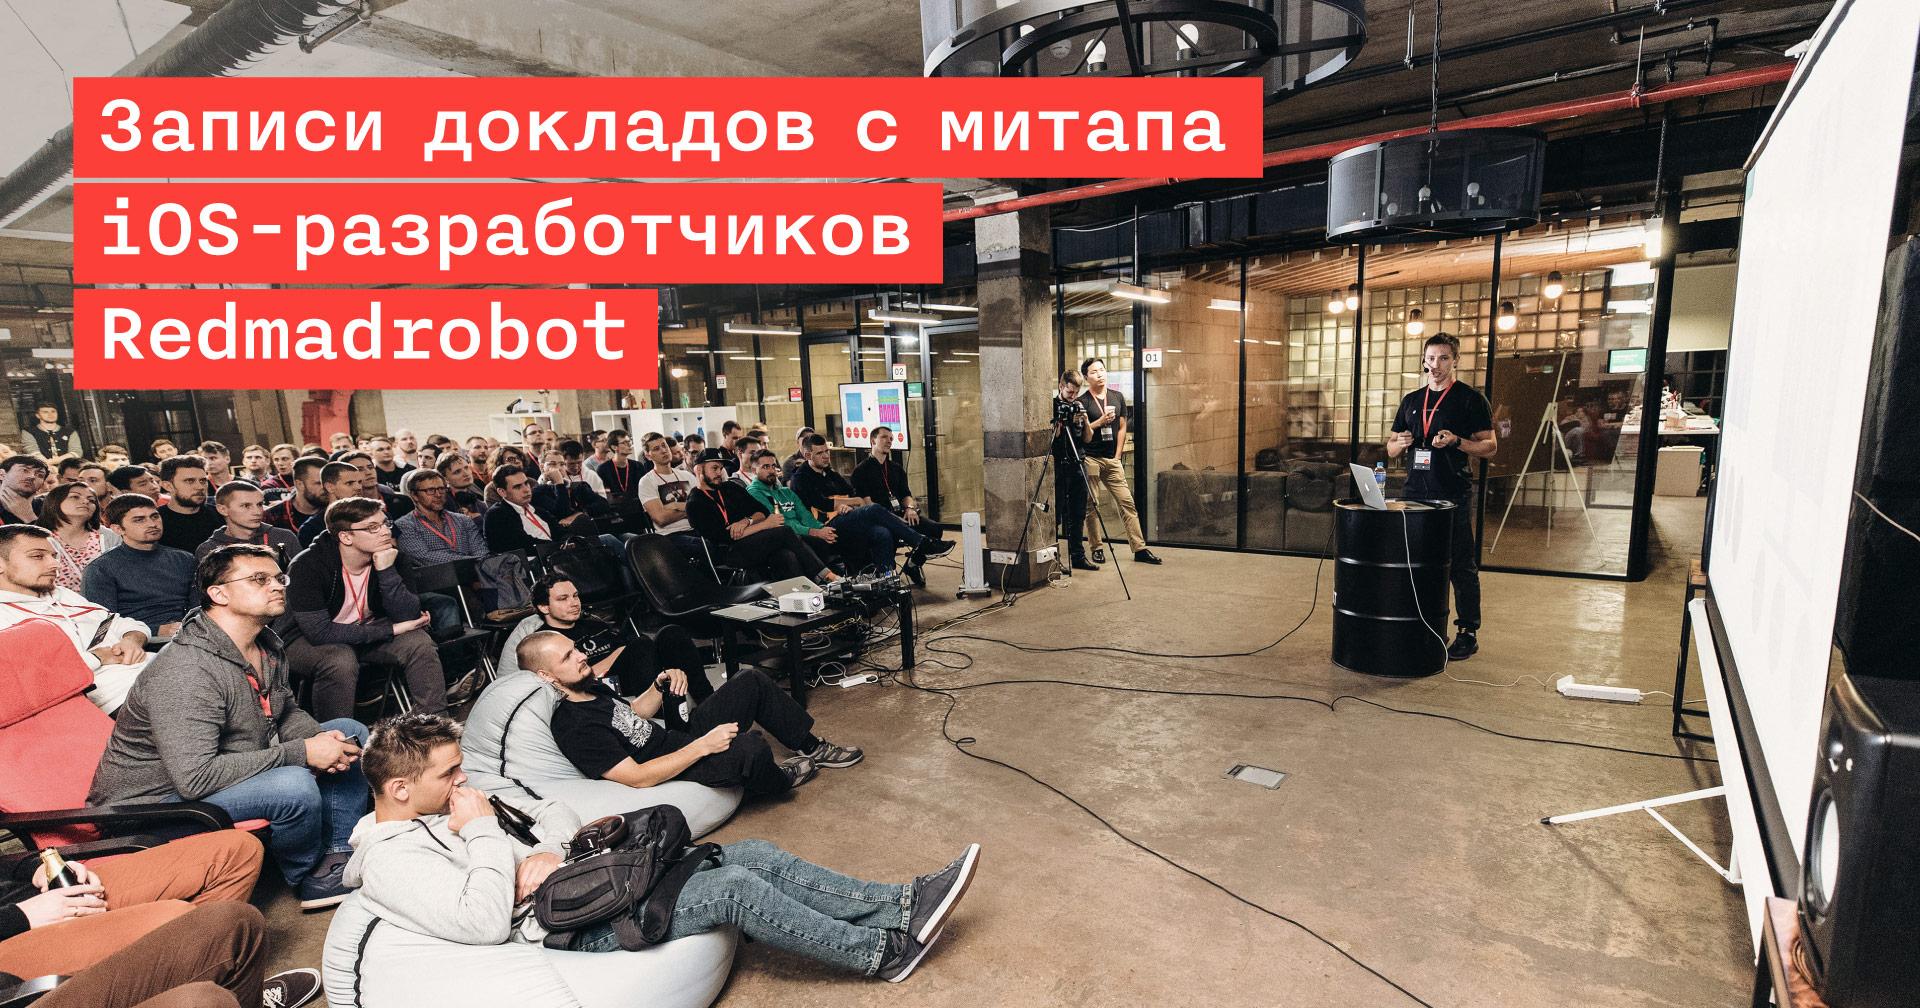 Записи докладов со второго iOS-митапа Redmadrobot